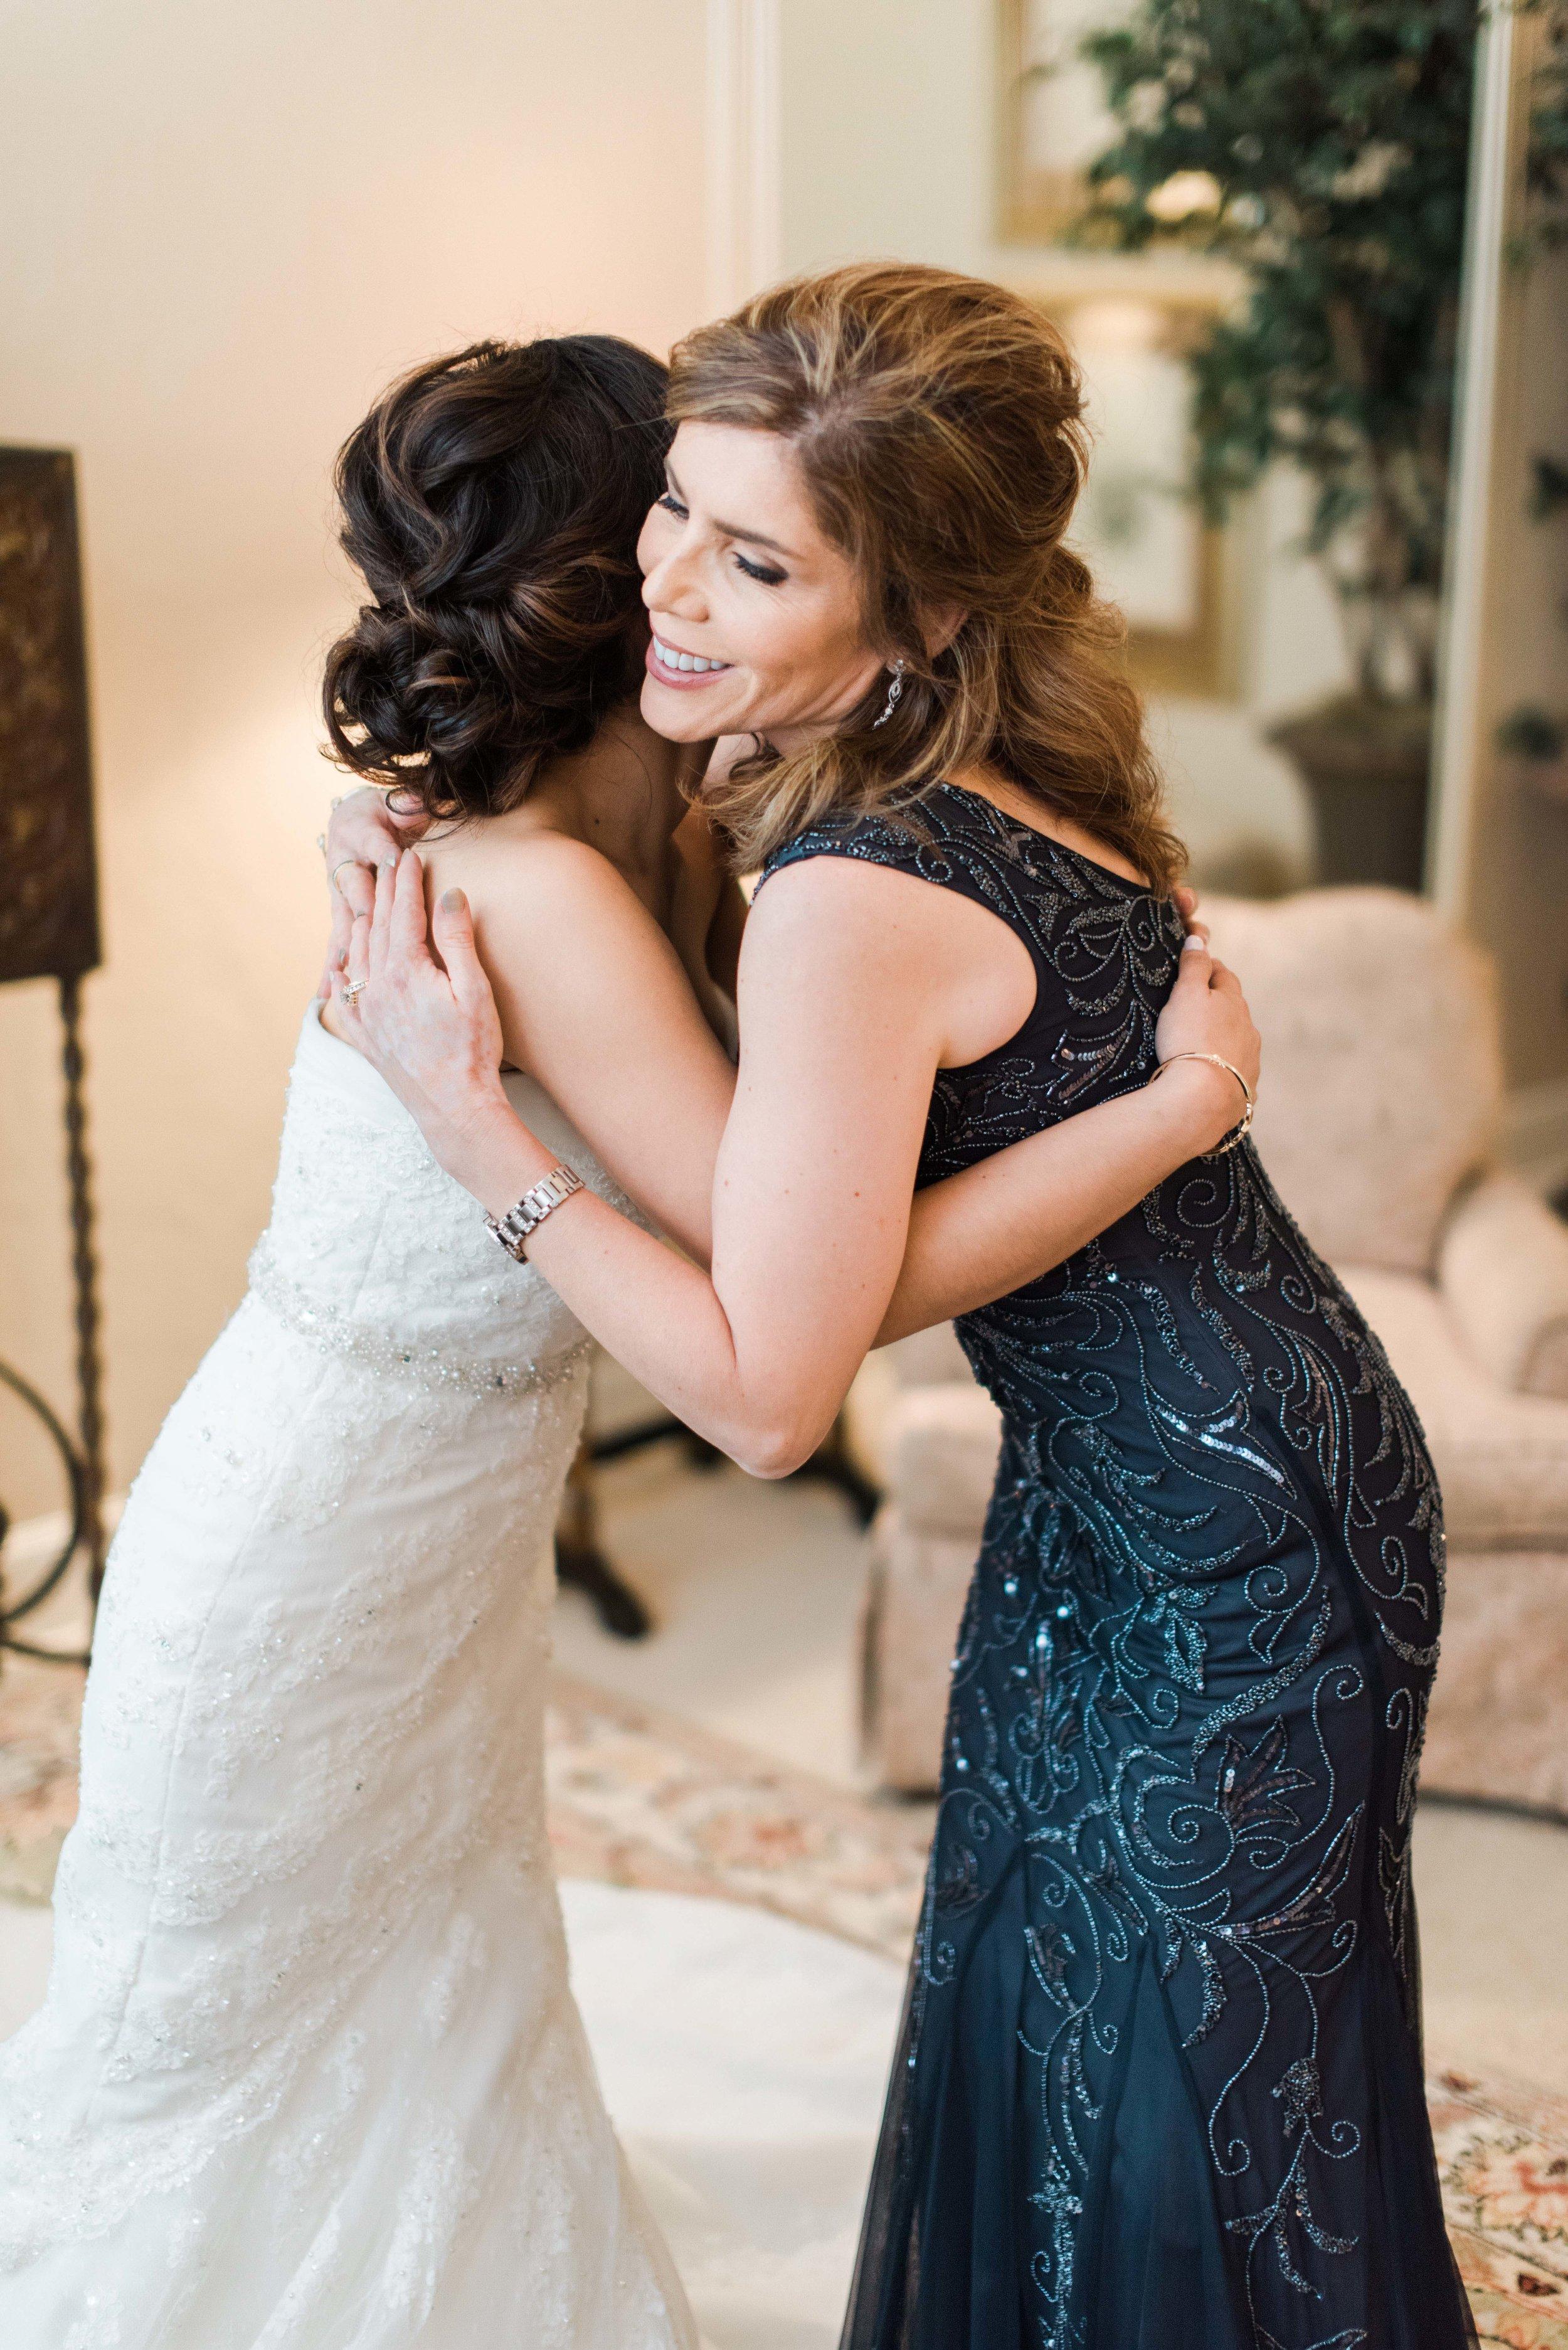 Houston-Wedding-Photography-St.-Anne-Catholic-Church-Houston-Wedding-The-Bell-Tower-on-34th-reception-wedding-film-4.jpg